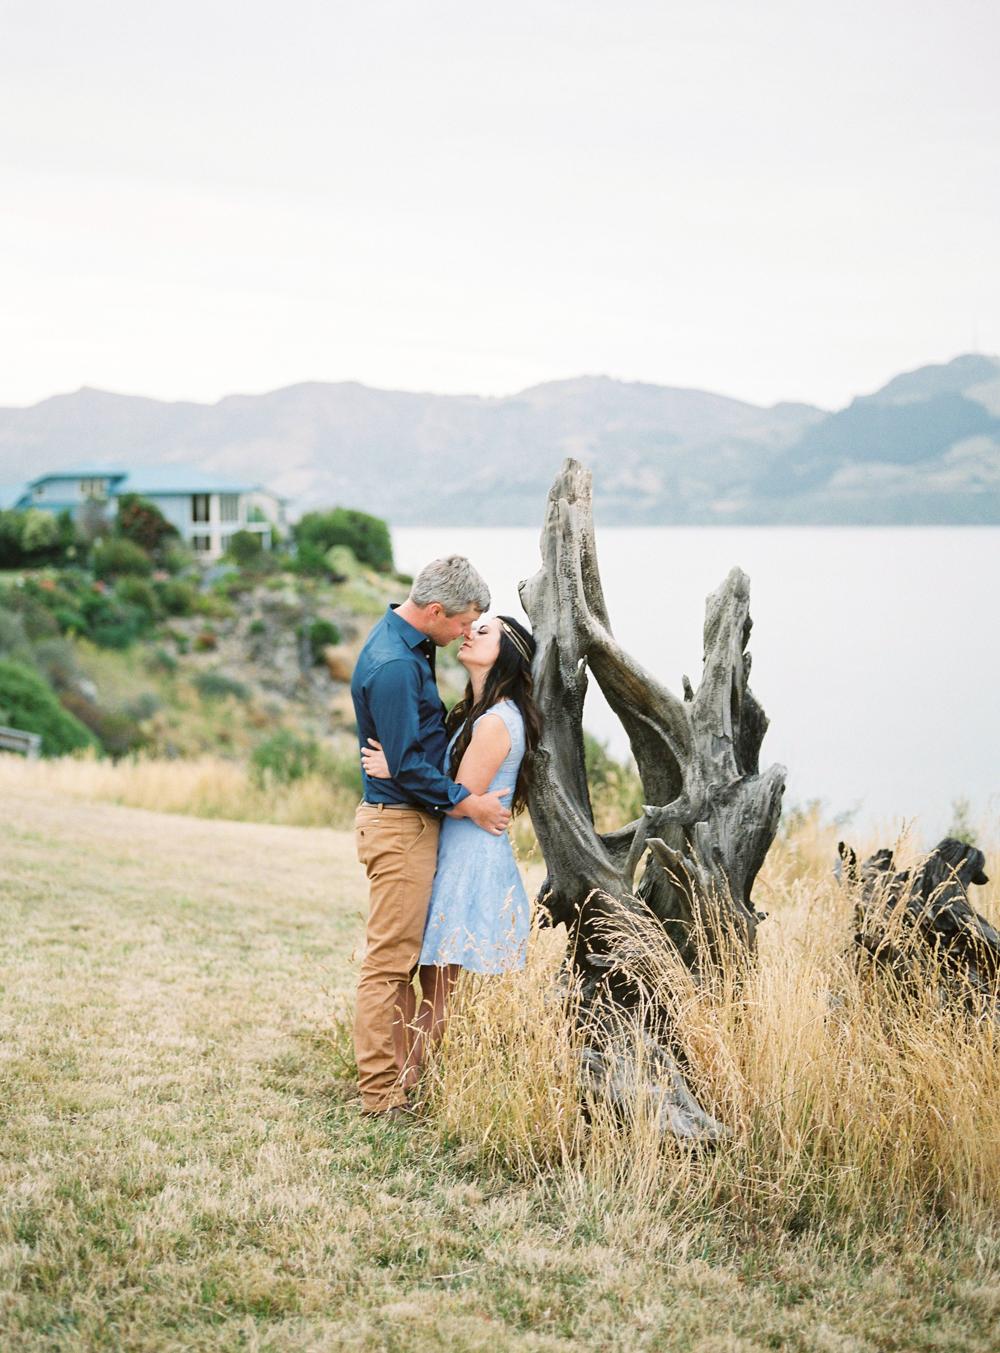 celine_chhuon_engagement_governor_bay_christchurch_newzealand_destination_photographer (4).jpg